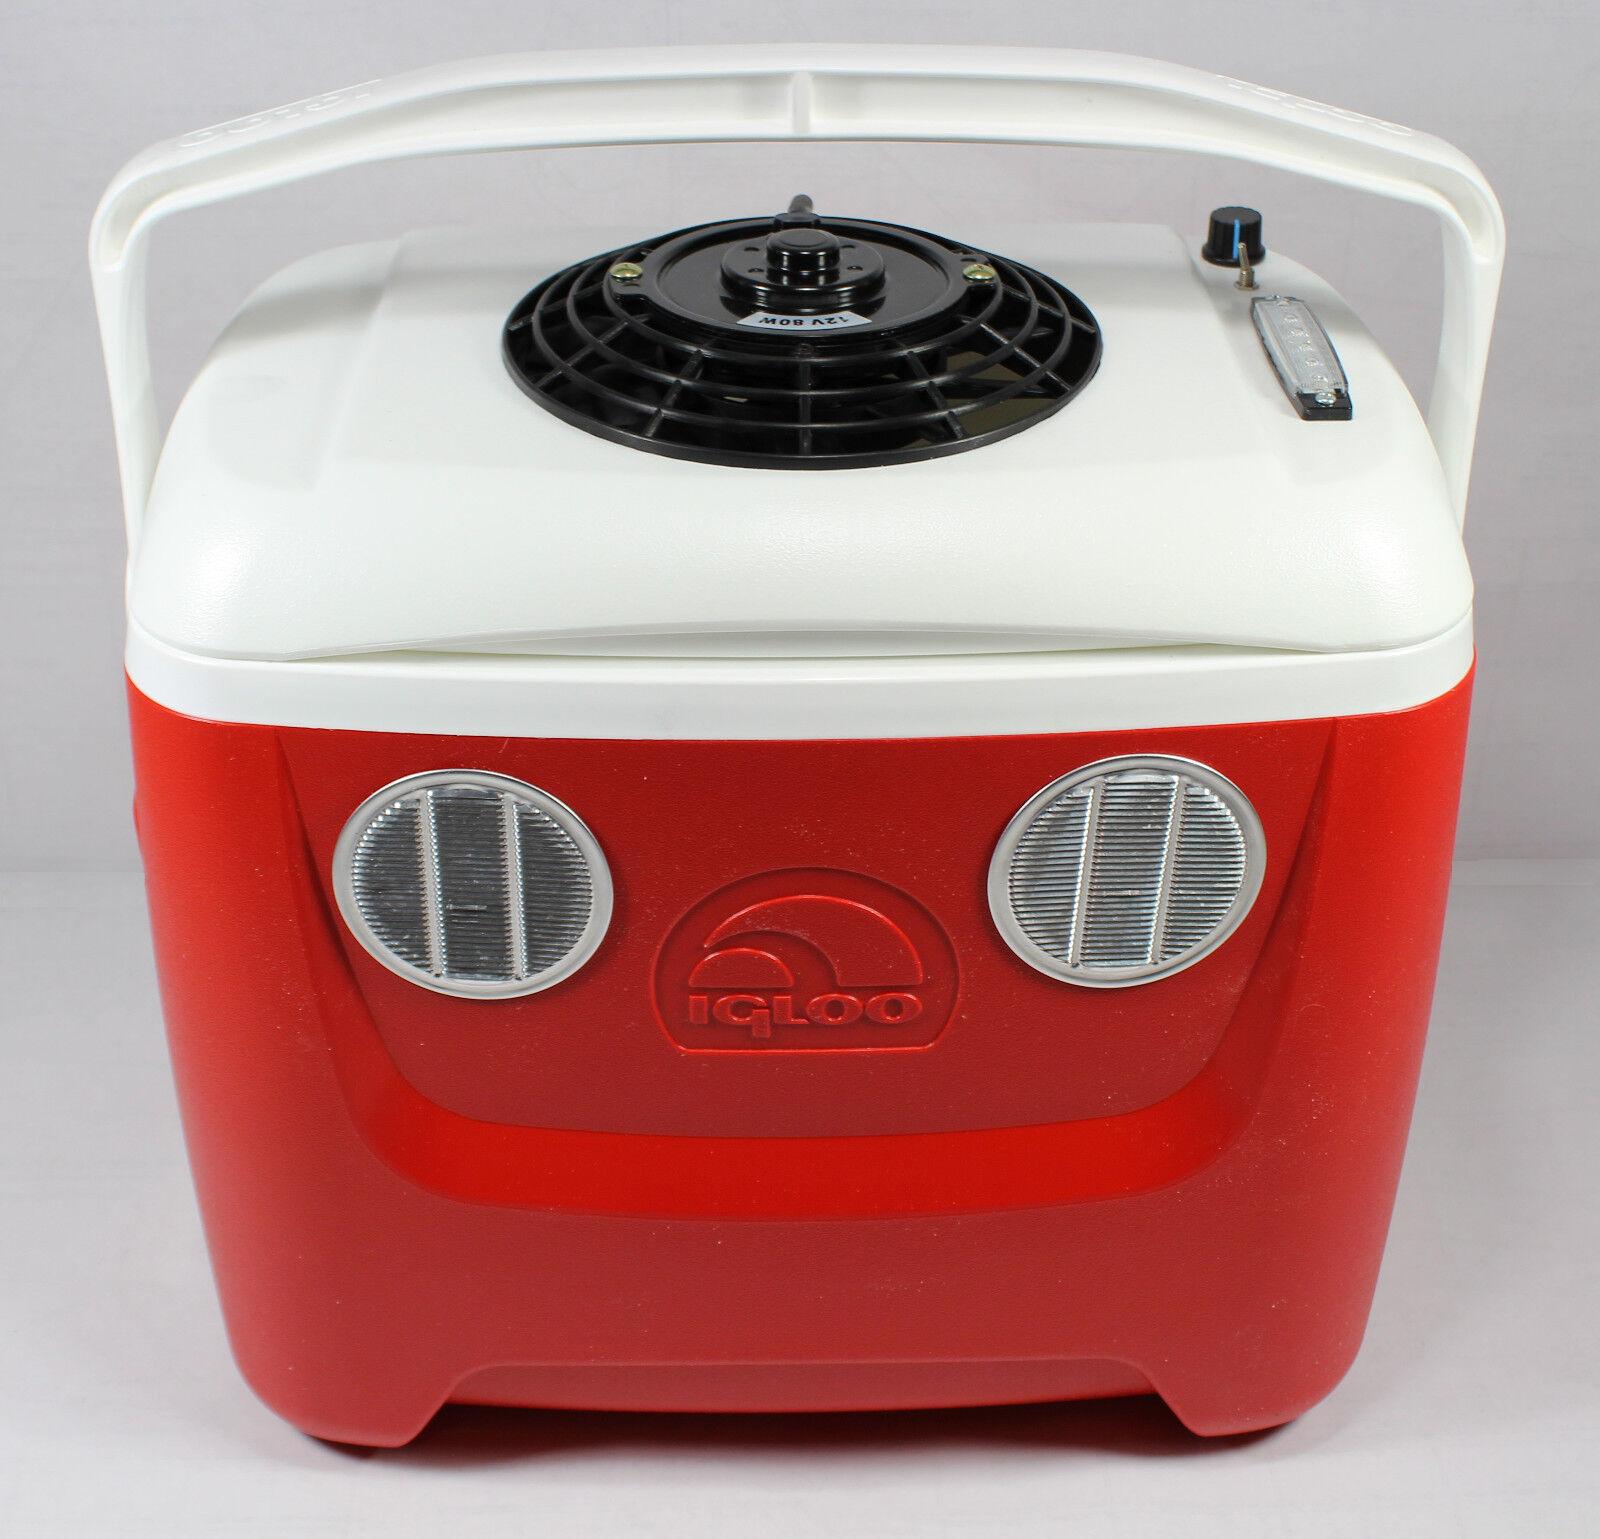 12V Portable Air Conditioner cooler 30 Quart - 560 CFM Digit